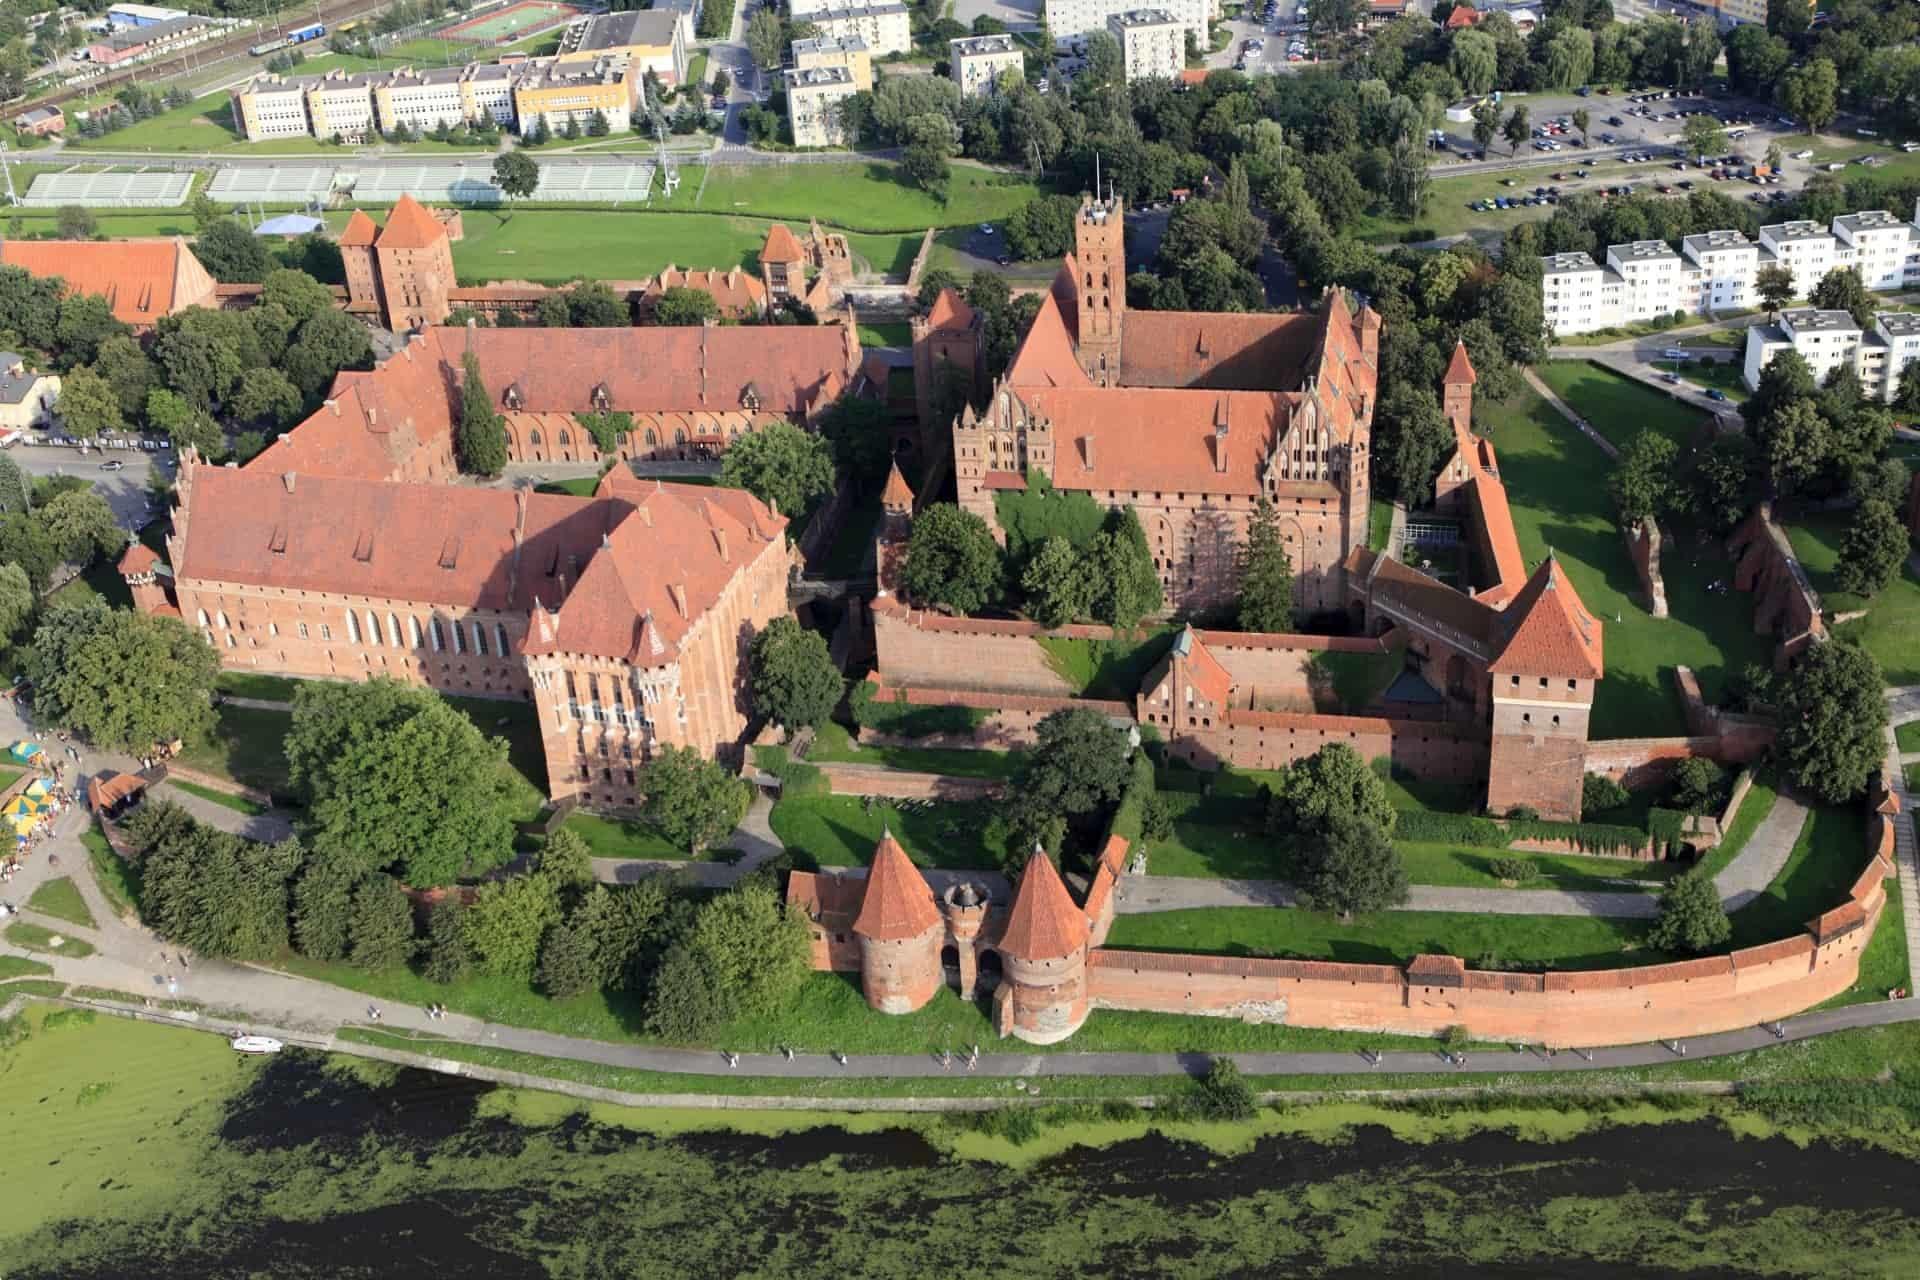 Teutonic castle in Malbork Poland